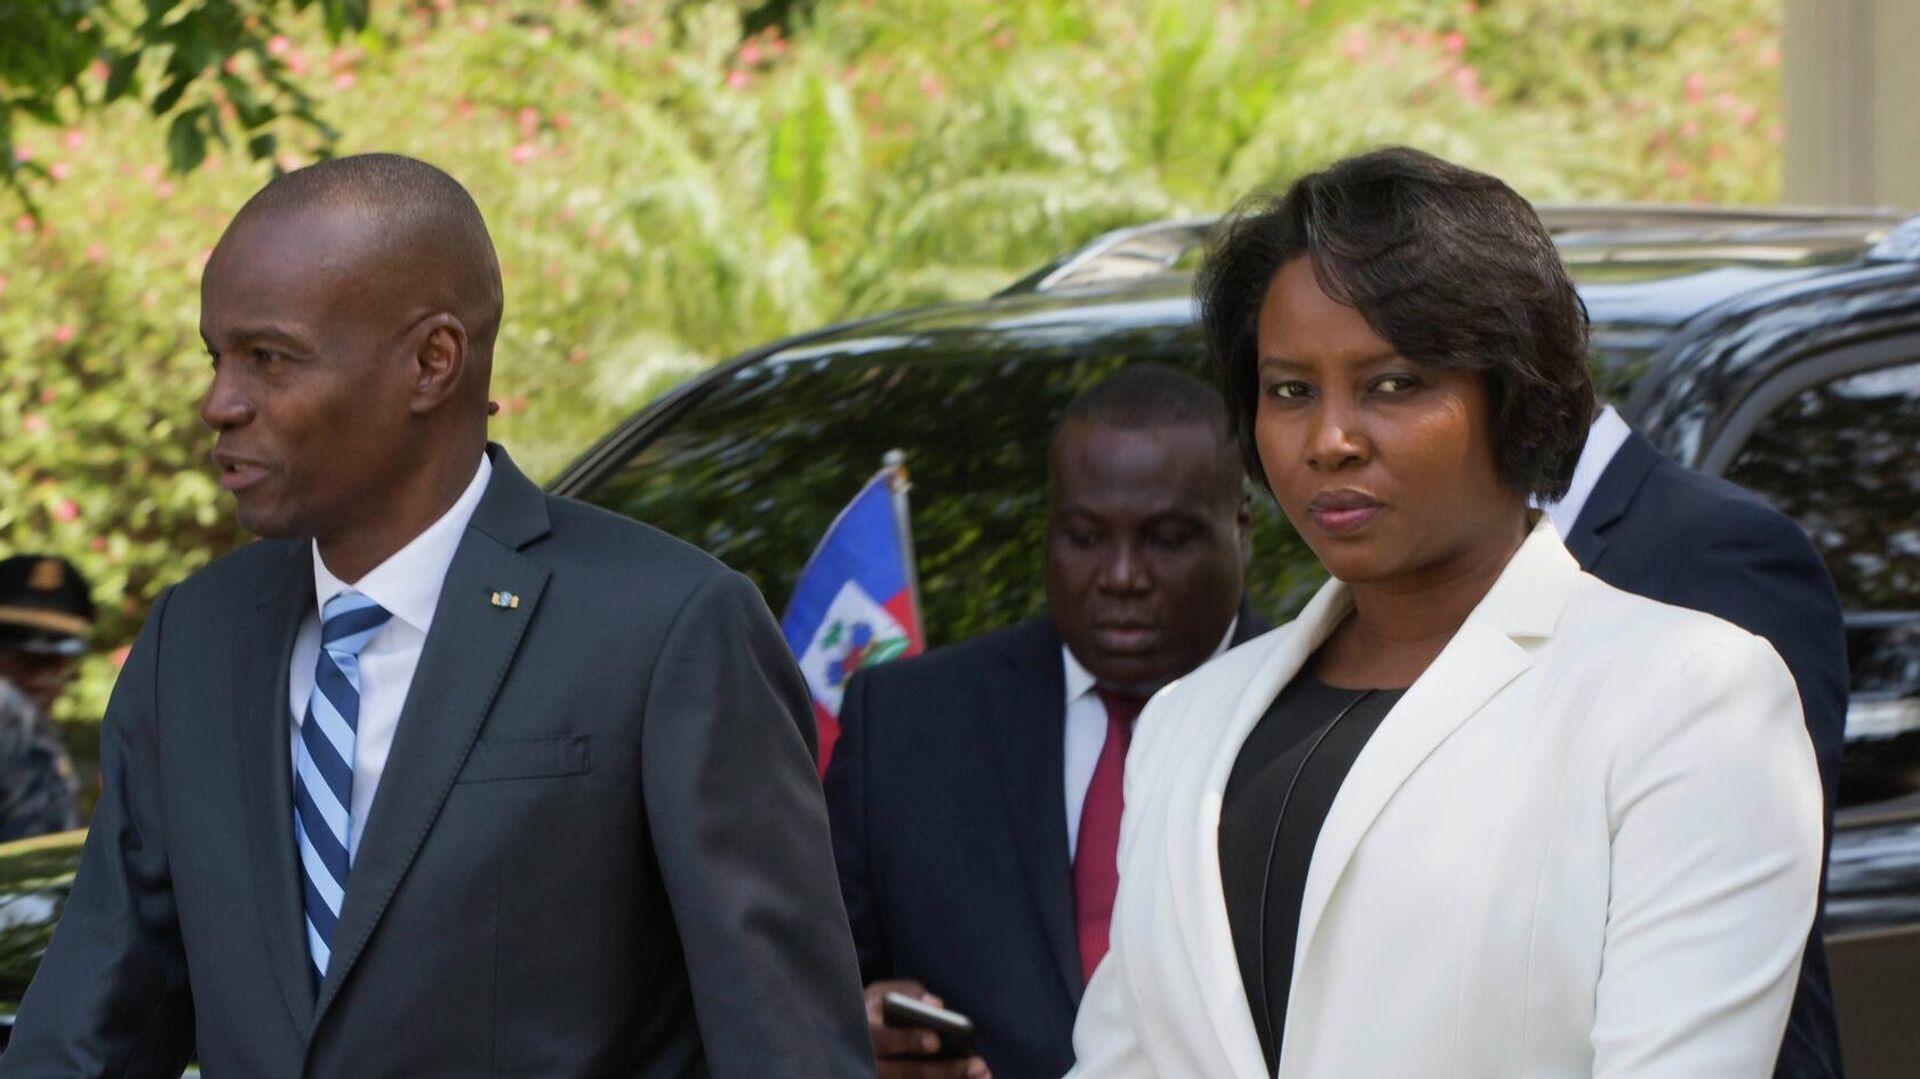 Jovenel Moise, expresidente de Haití y su esposa Martine (archivo) - Sputnik Mundo, 1920, 17.09.2021